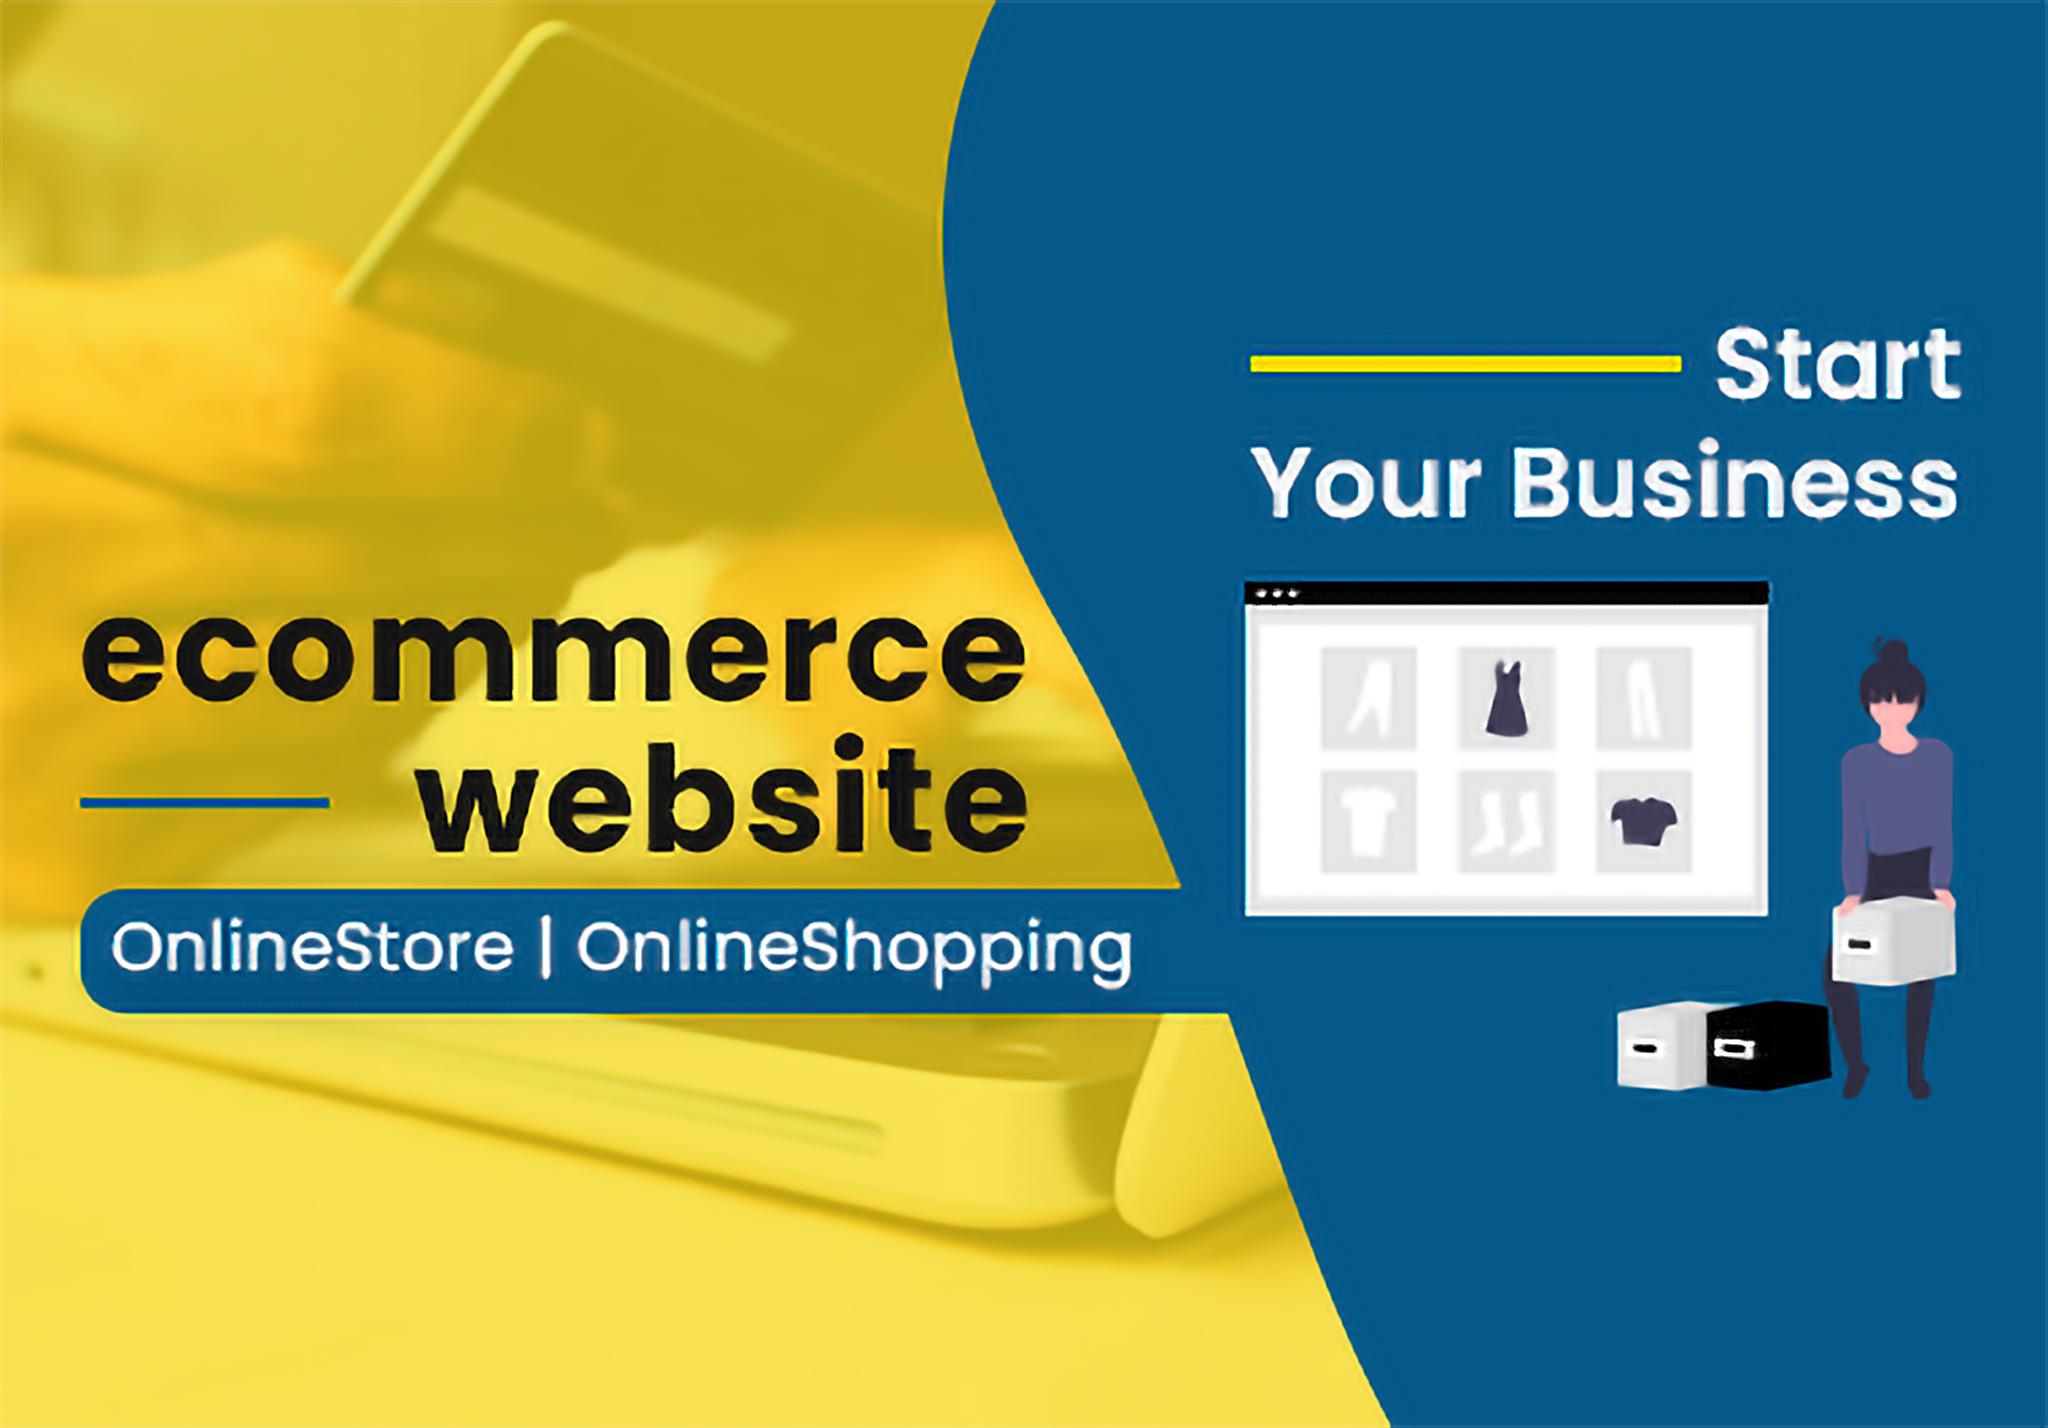 Build an impressive ecommerce online shopping website